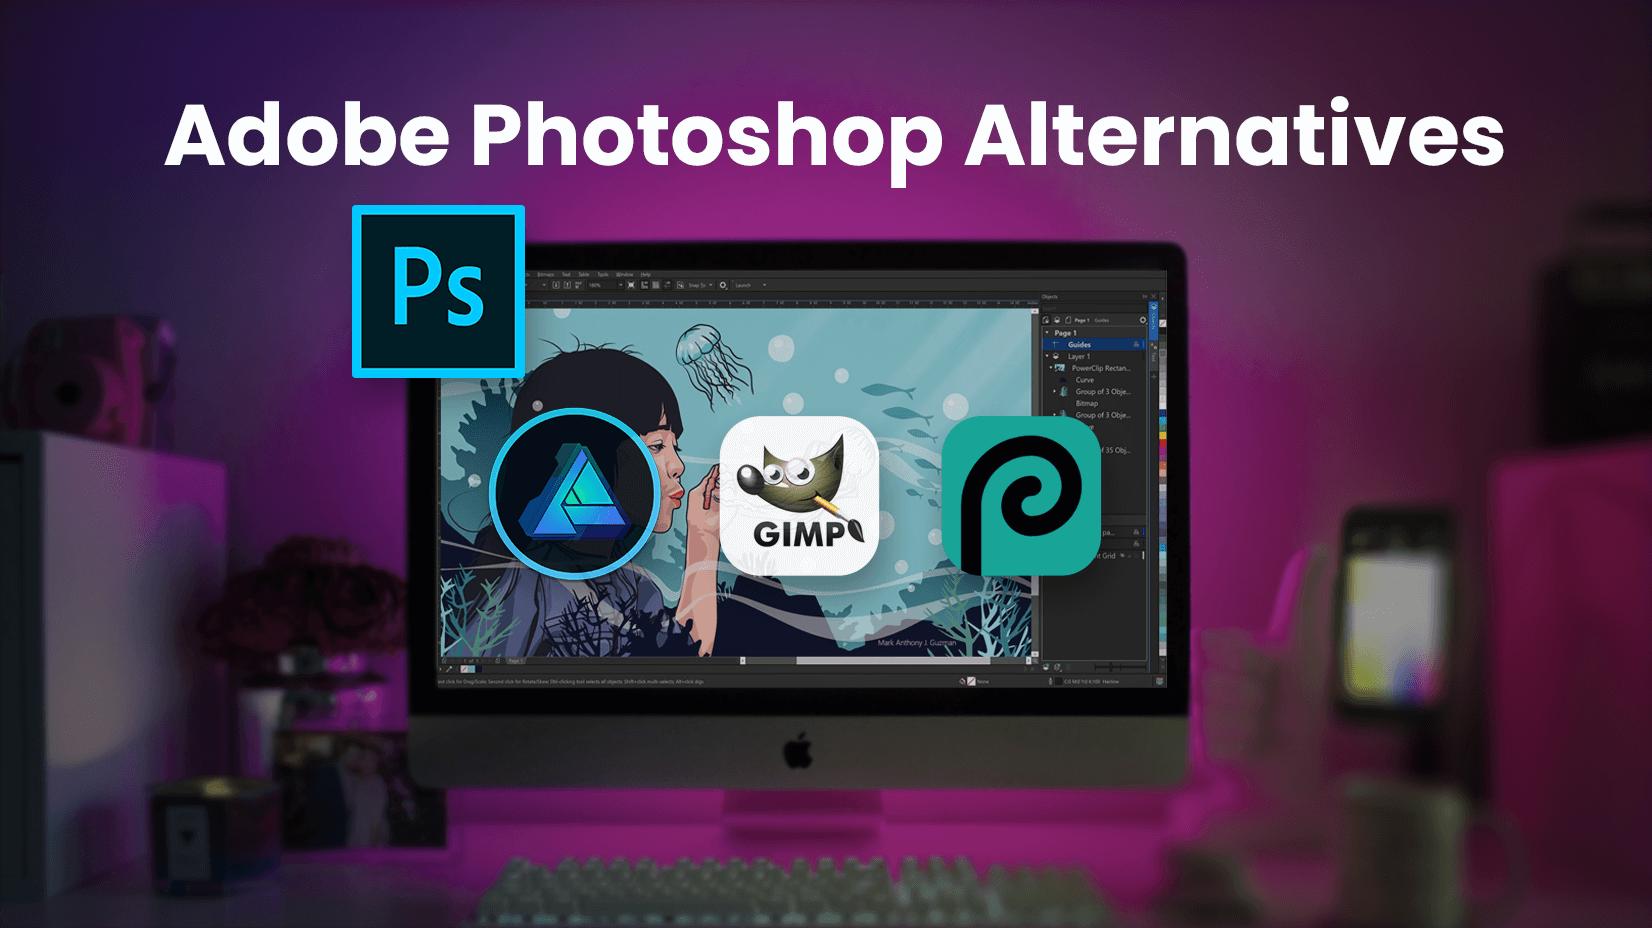 Top Adobe Photoshop Alternatives in 2021